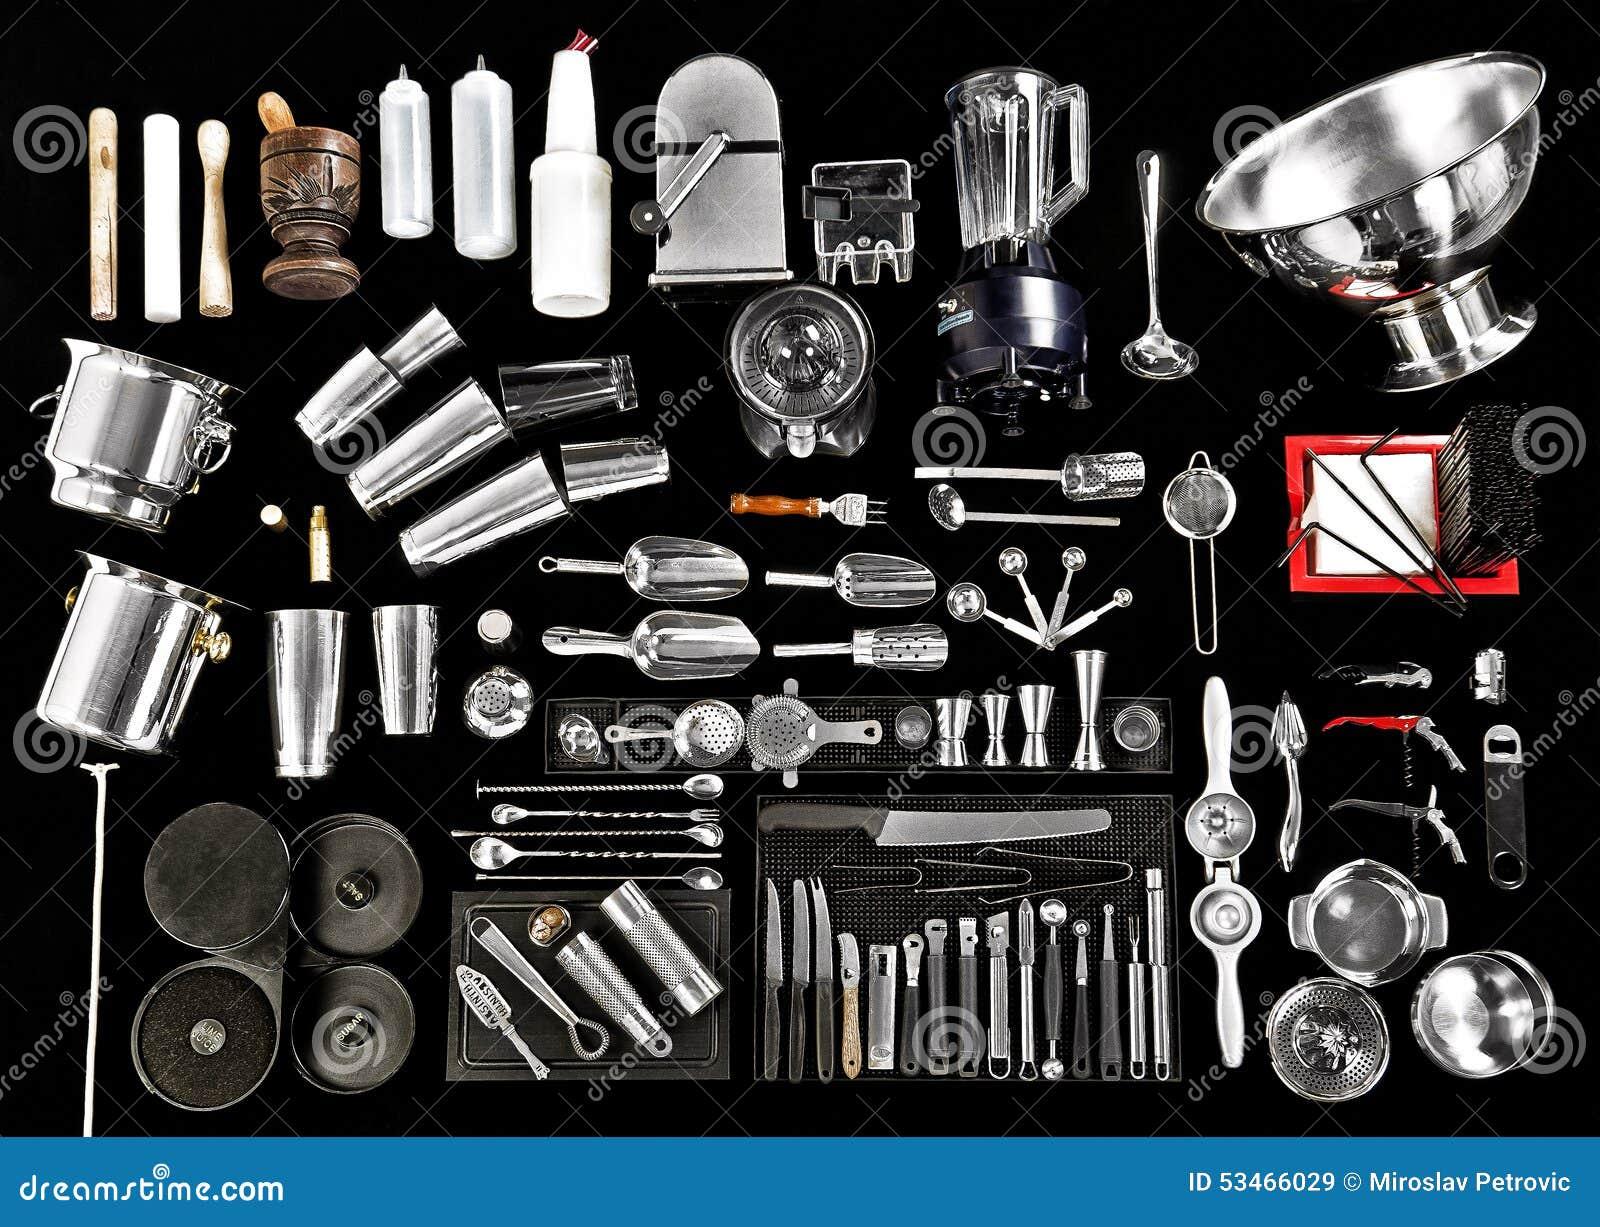 Bar Tender Equipment Stock Image Image Of Tongs